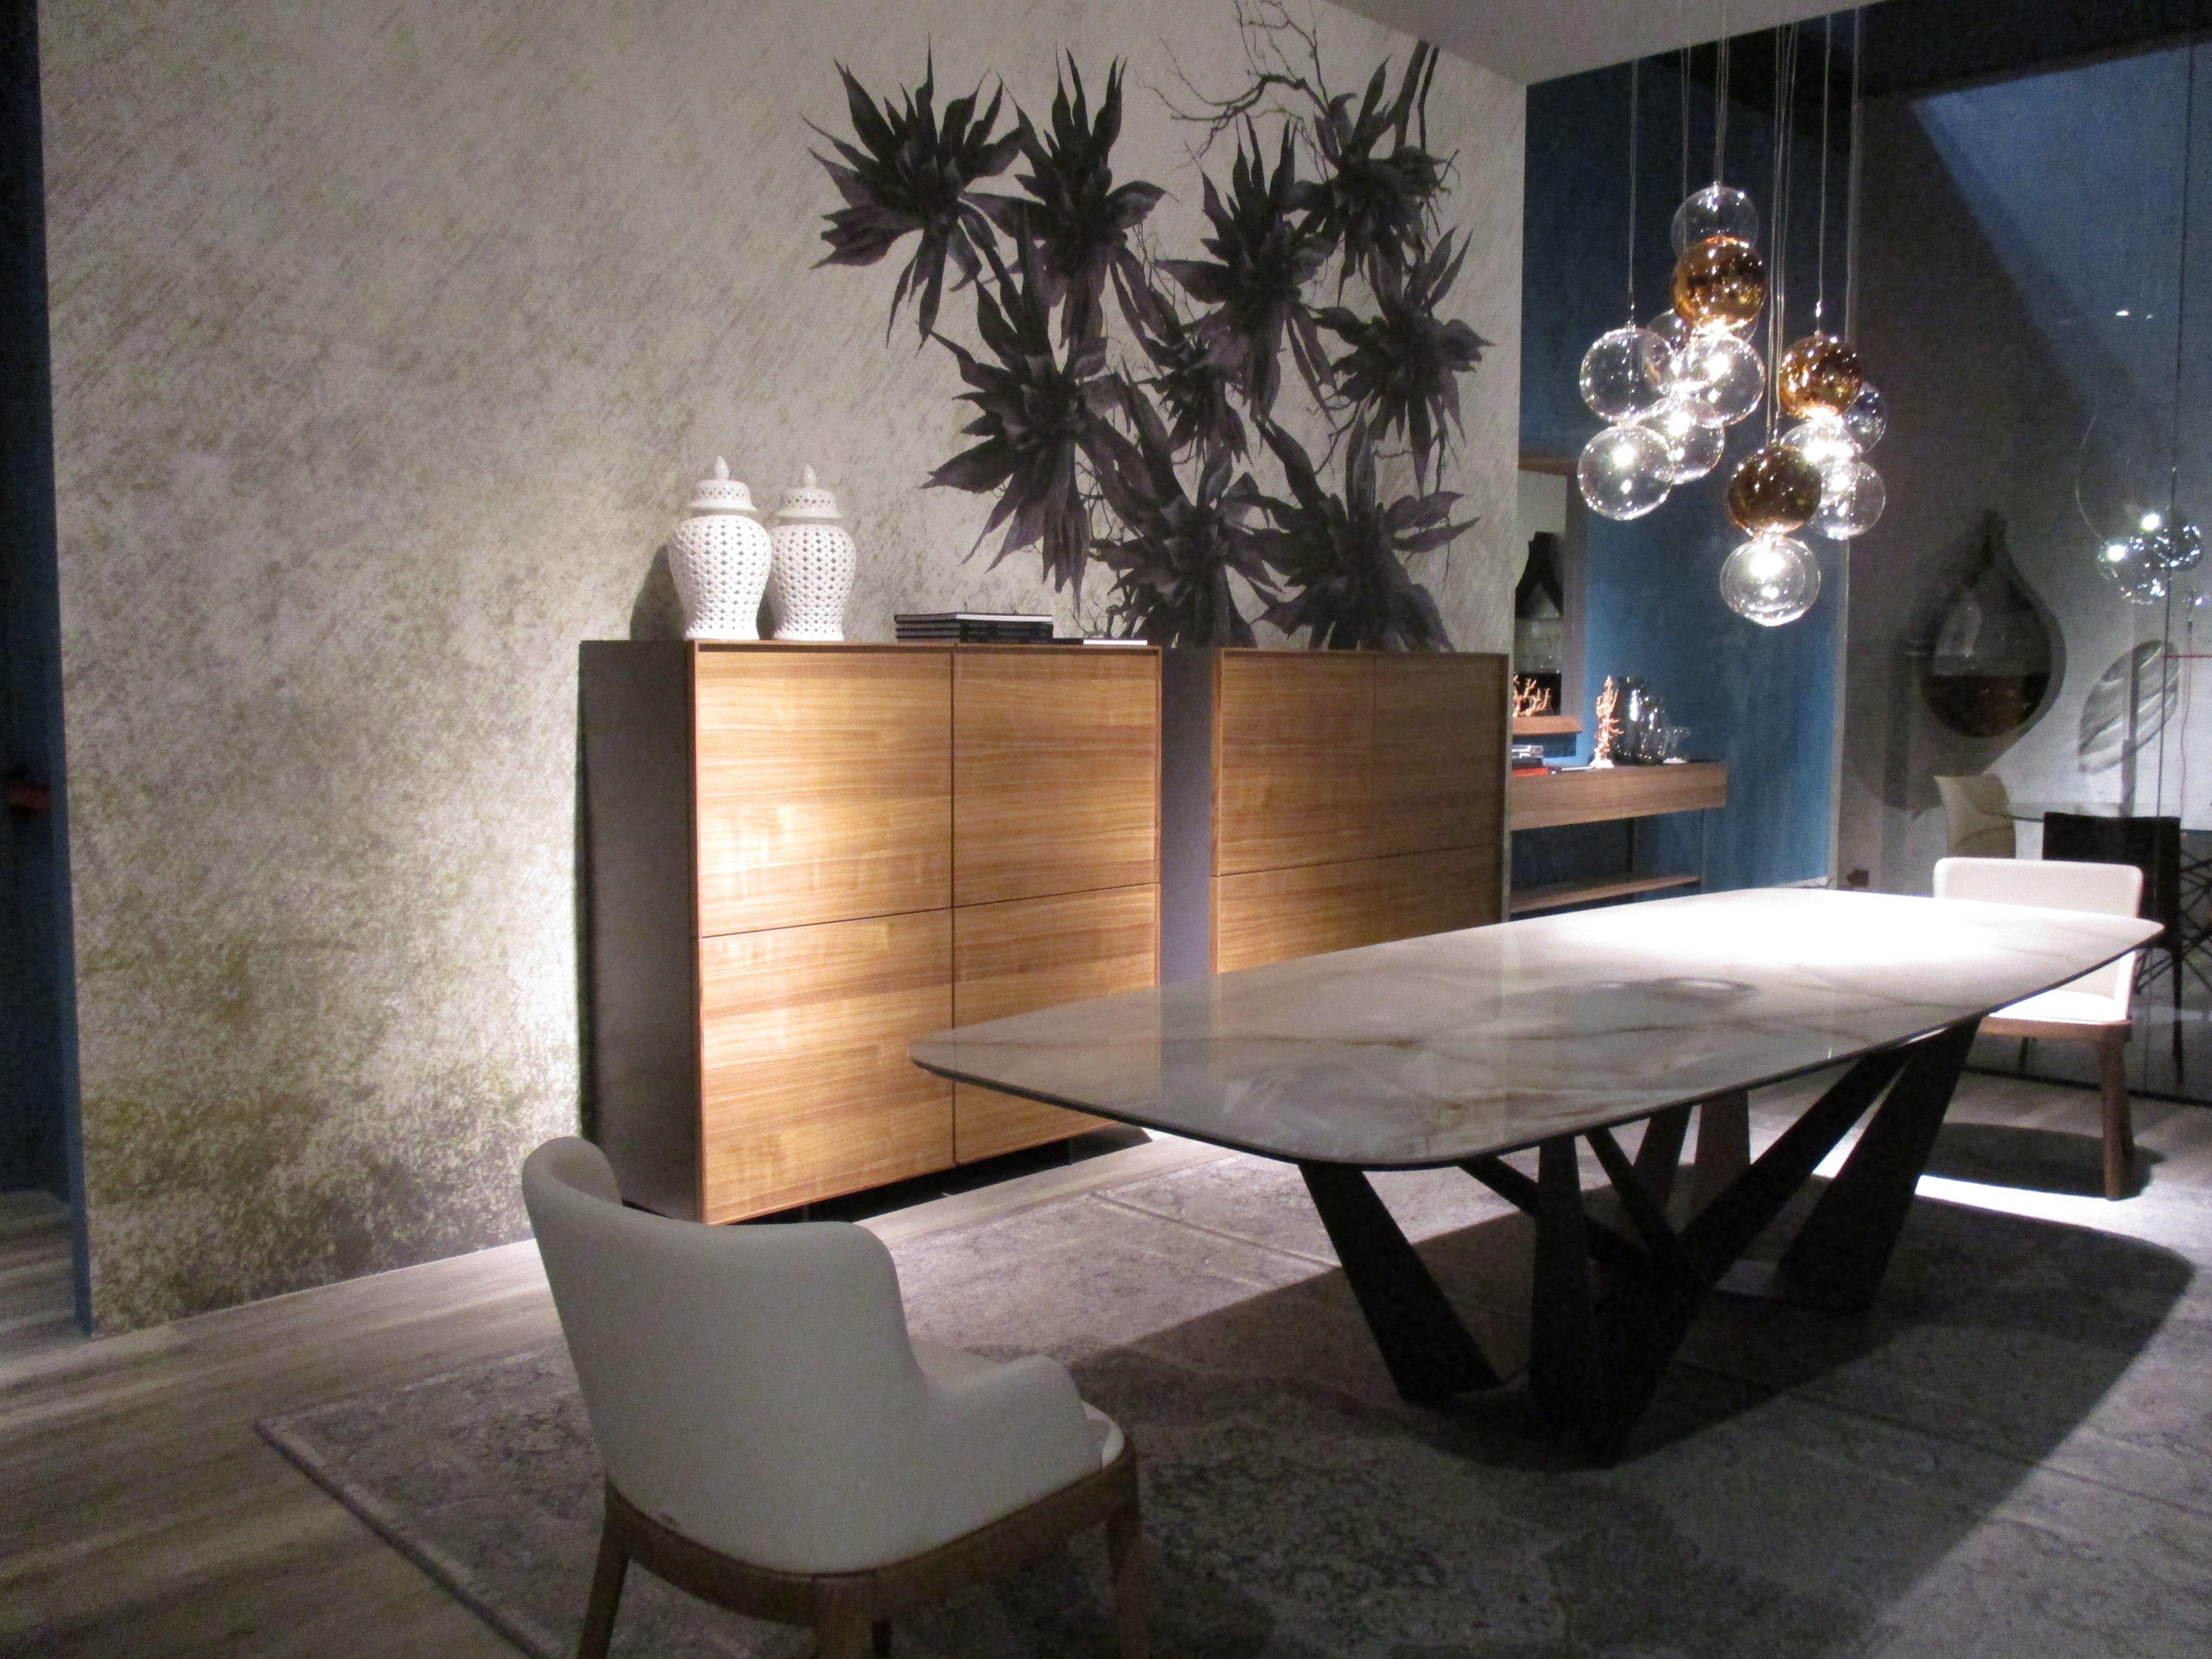 Credenza Con Tope De Marmol : Comedor mesa de mármol aparador madera salone di mobile milano